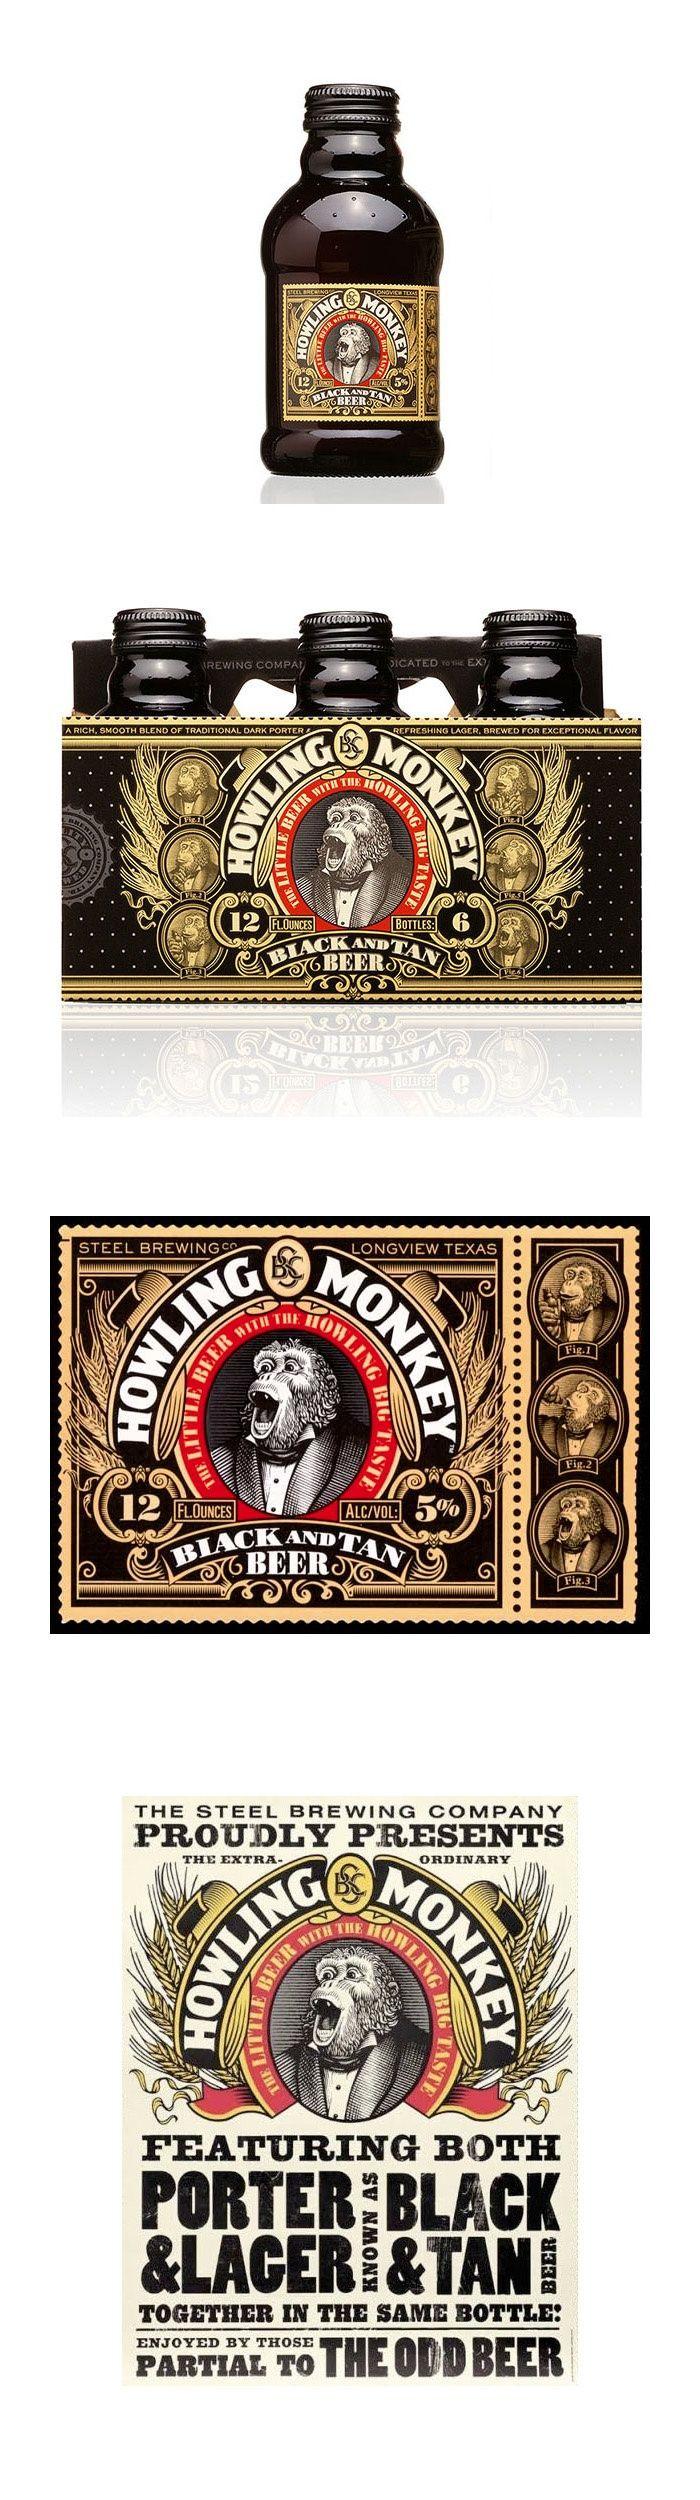 Howling Monkey Beer *** Designed by Turner Duckworth